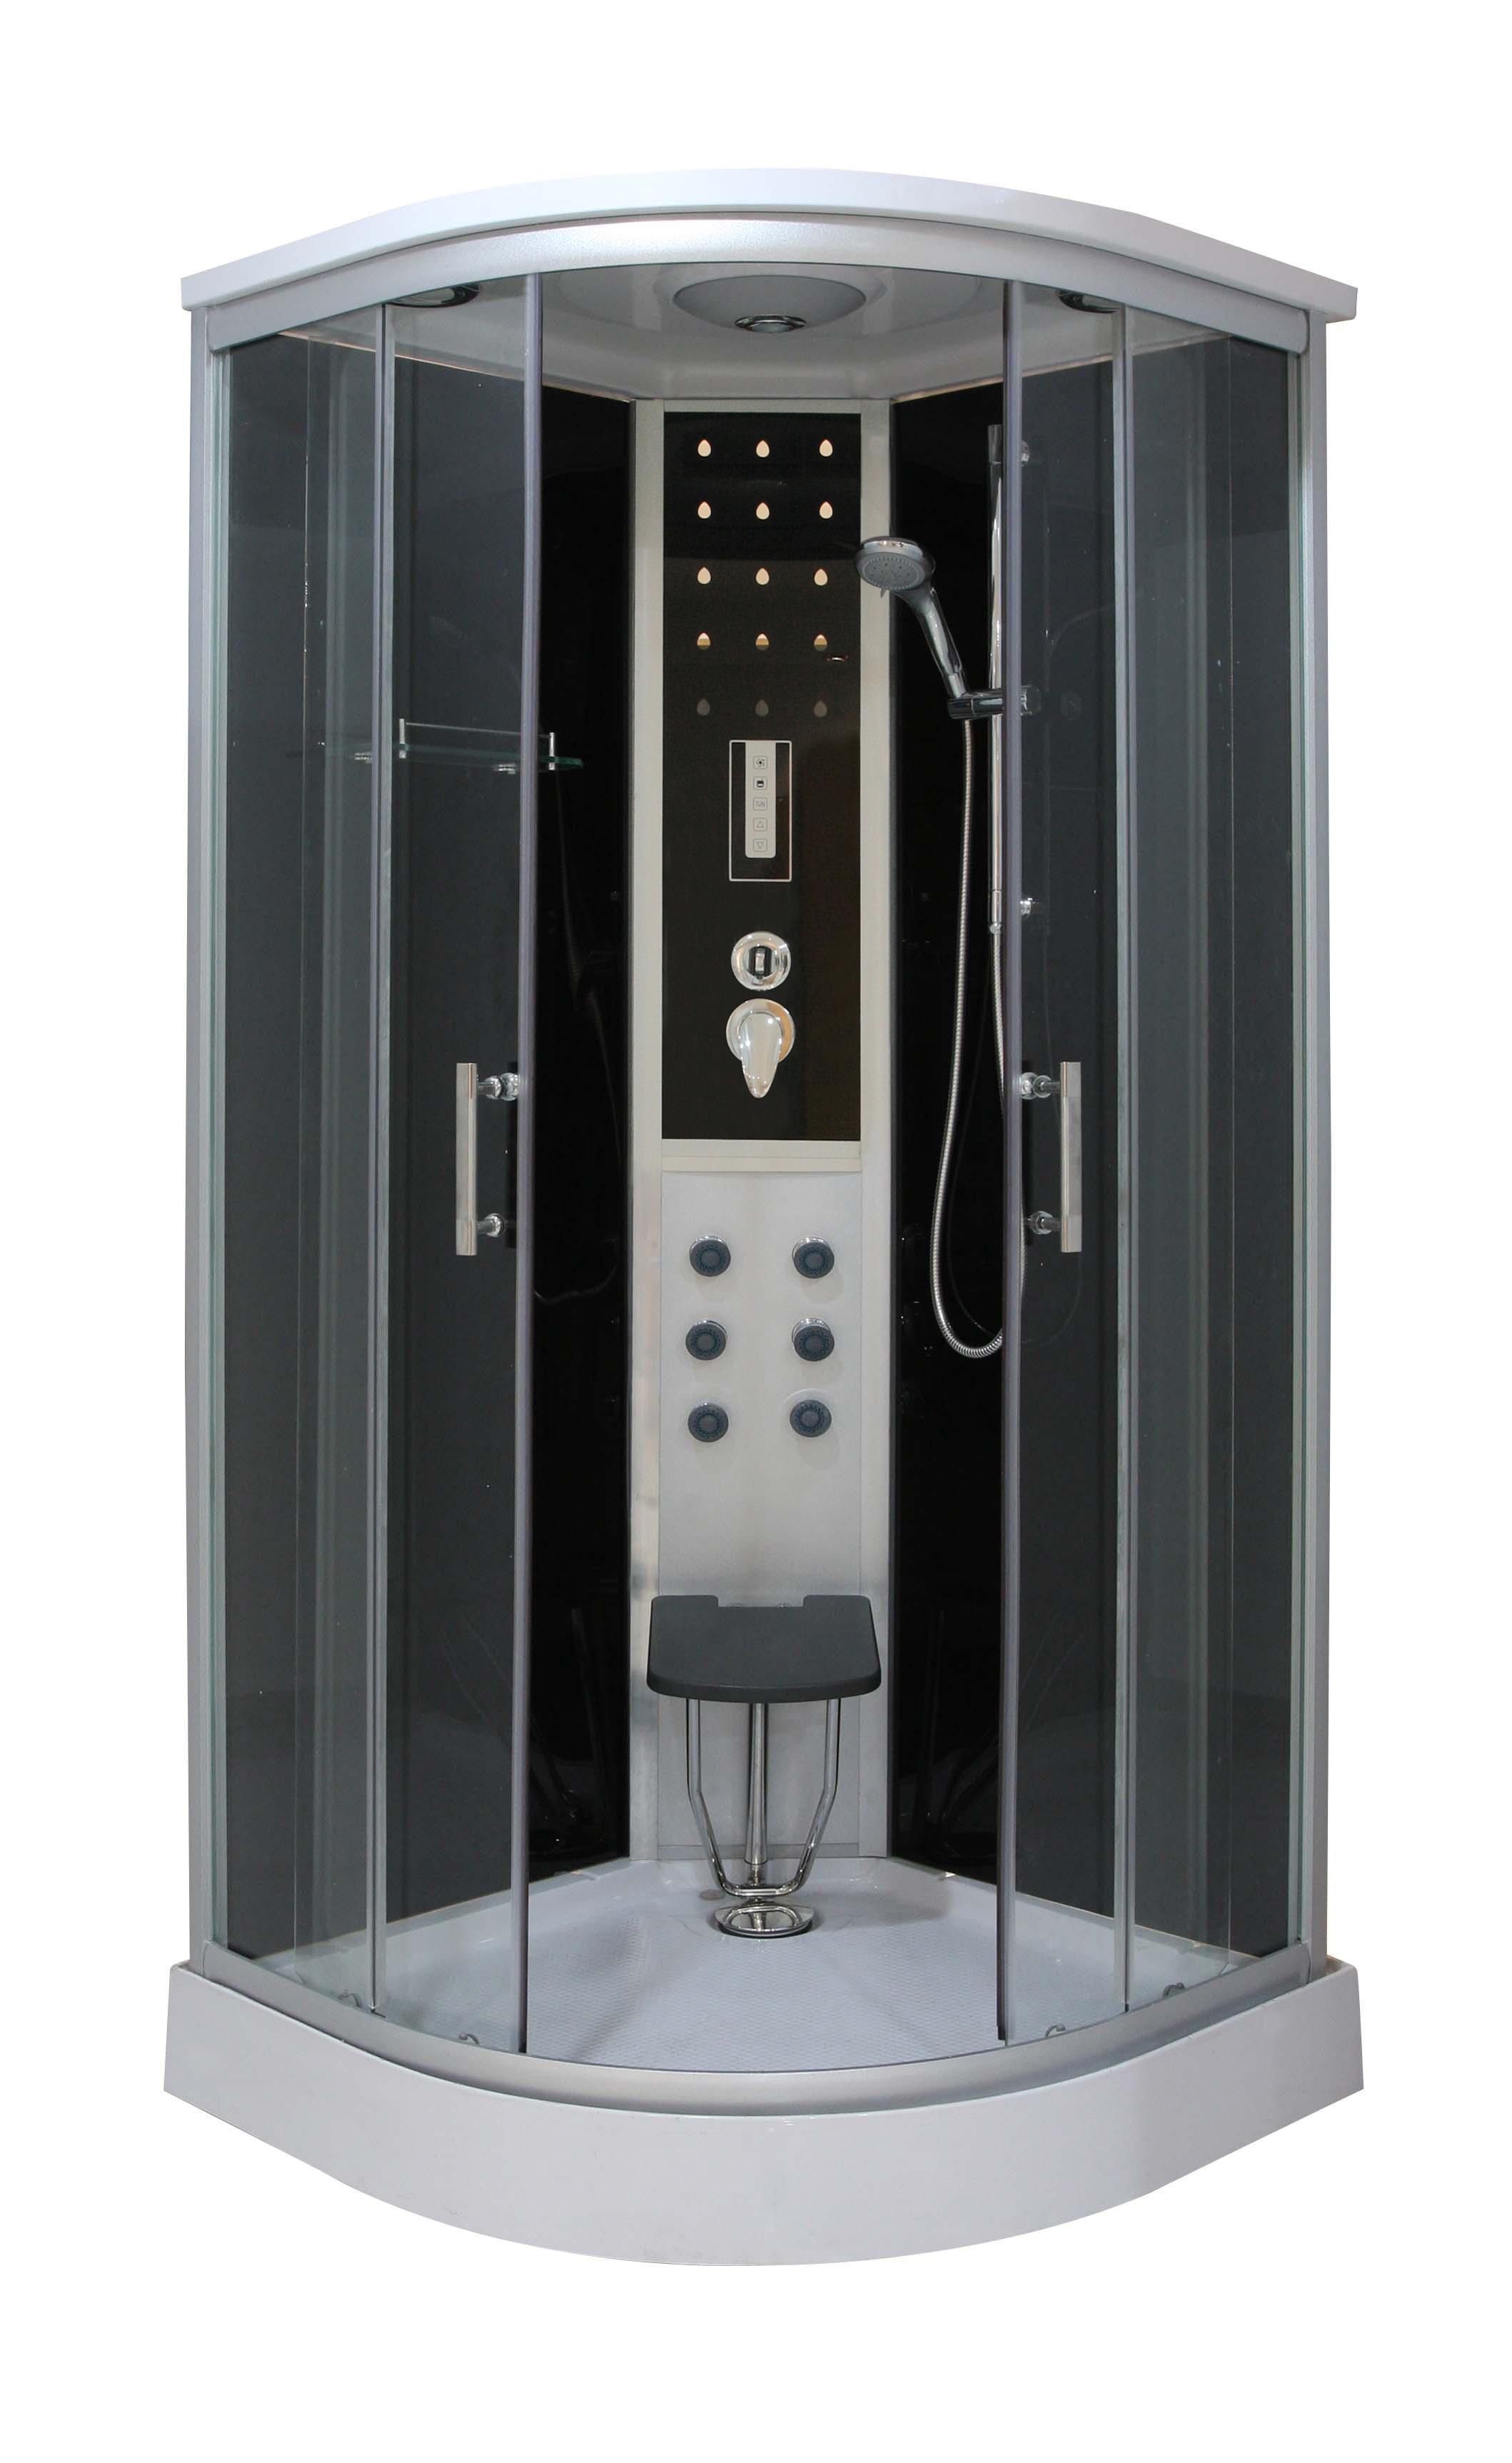 Parna tu kabina sanotechnik relax 90x90x215 ql for Cabina doccia eklis montaggio